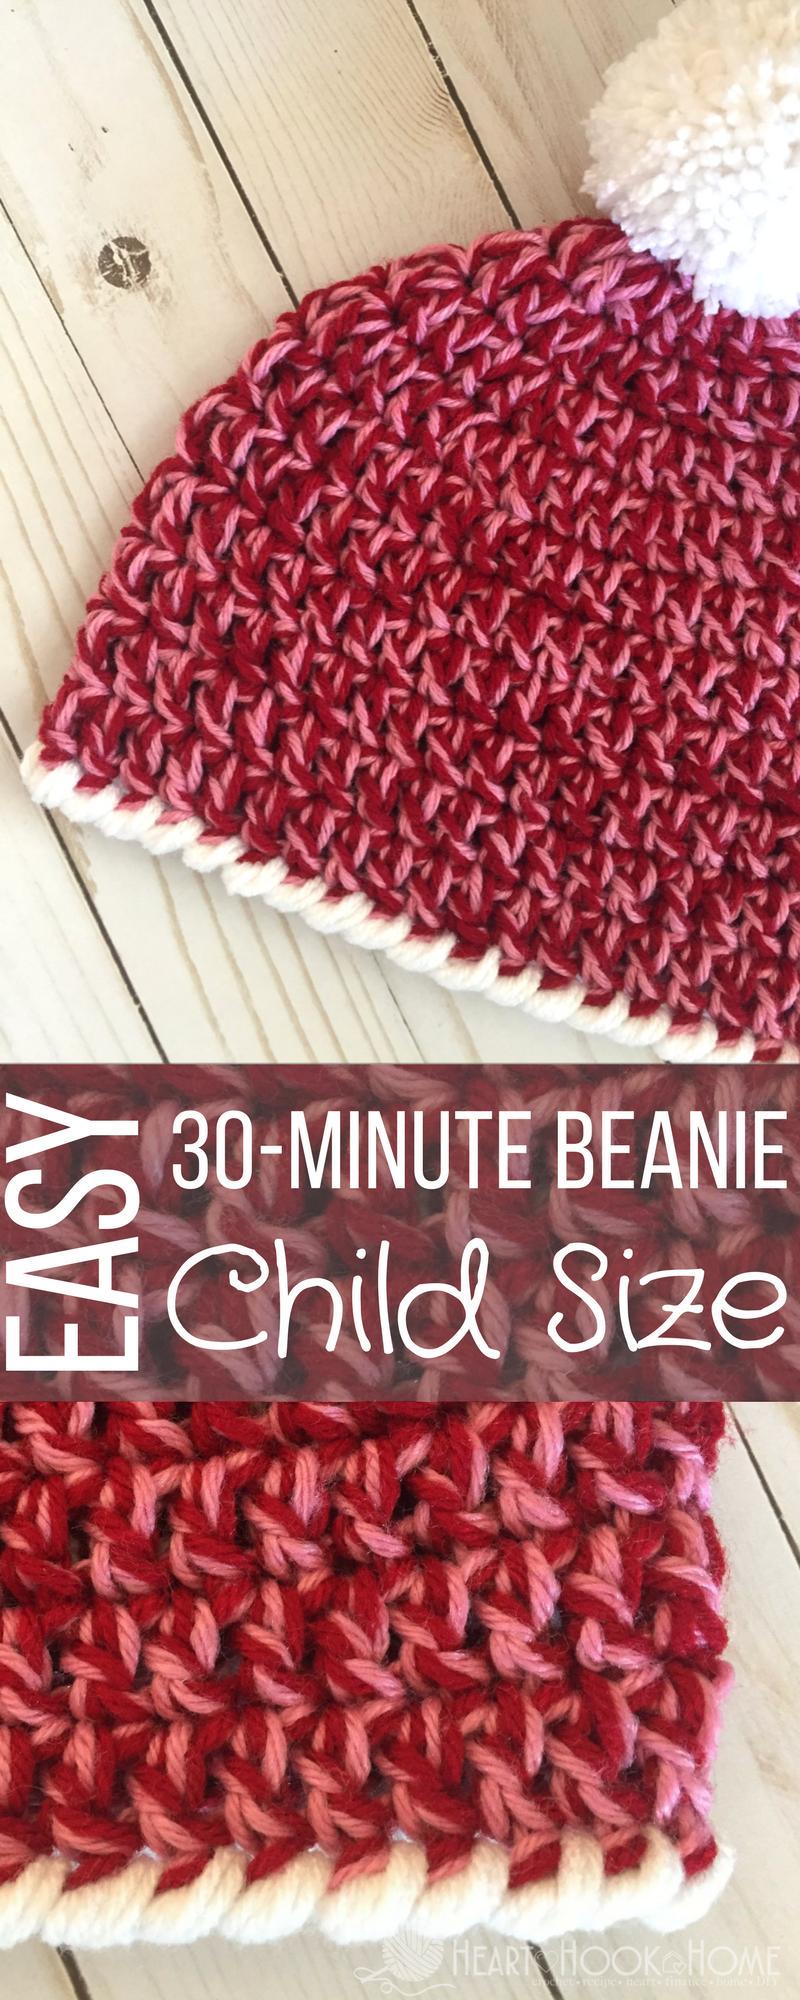 Child Size Easy Peasy 30-Minute Beanie Free Crochet Pattern | Gorros ...